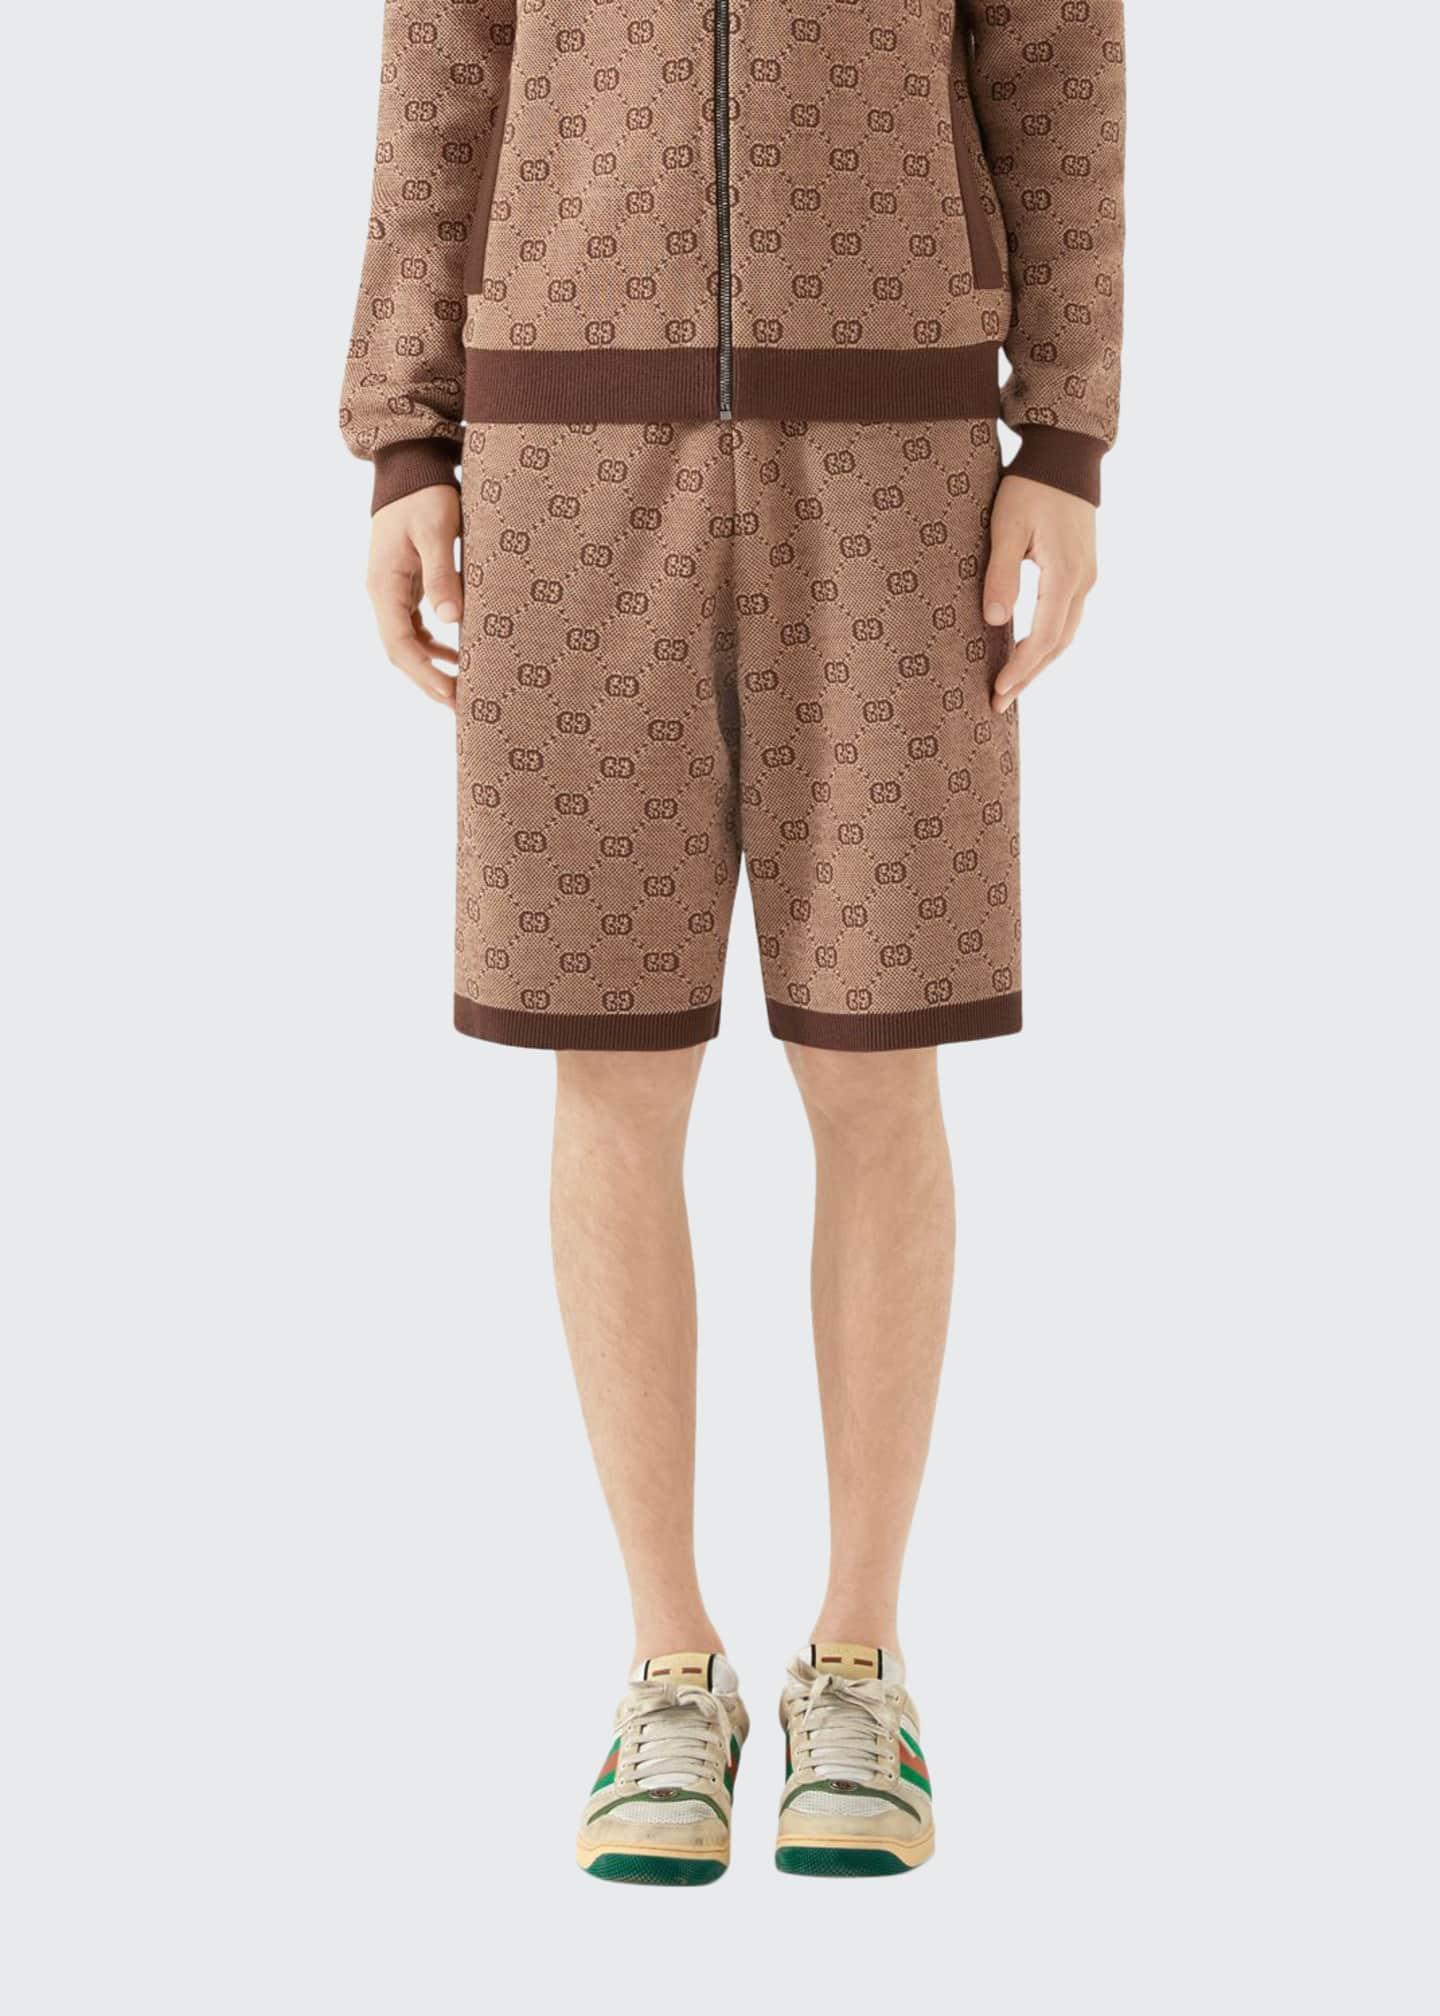 Gucci Men's GG Logo Knit Shorts